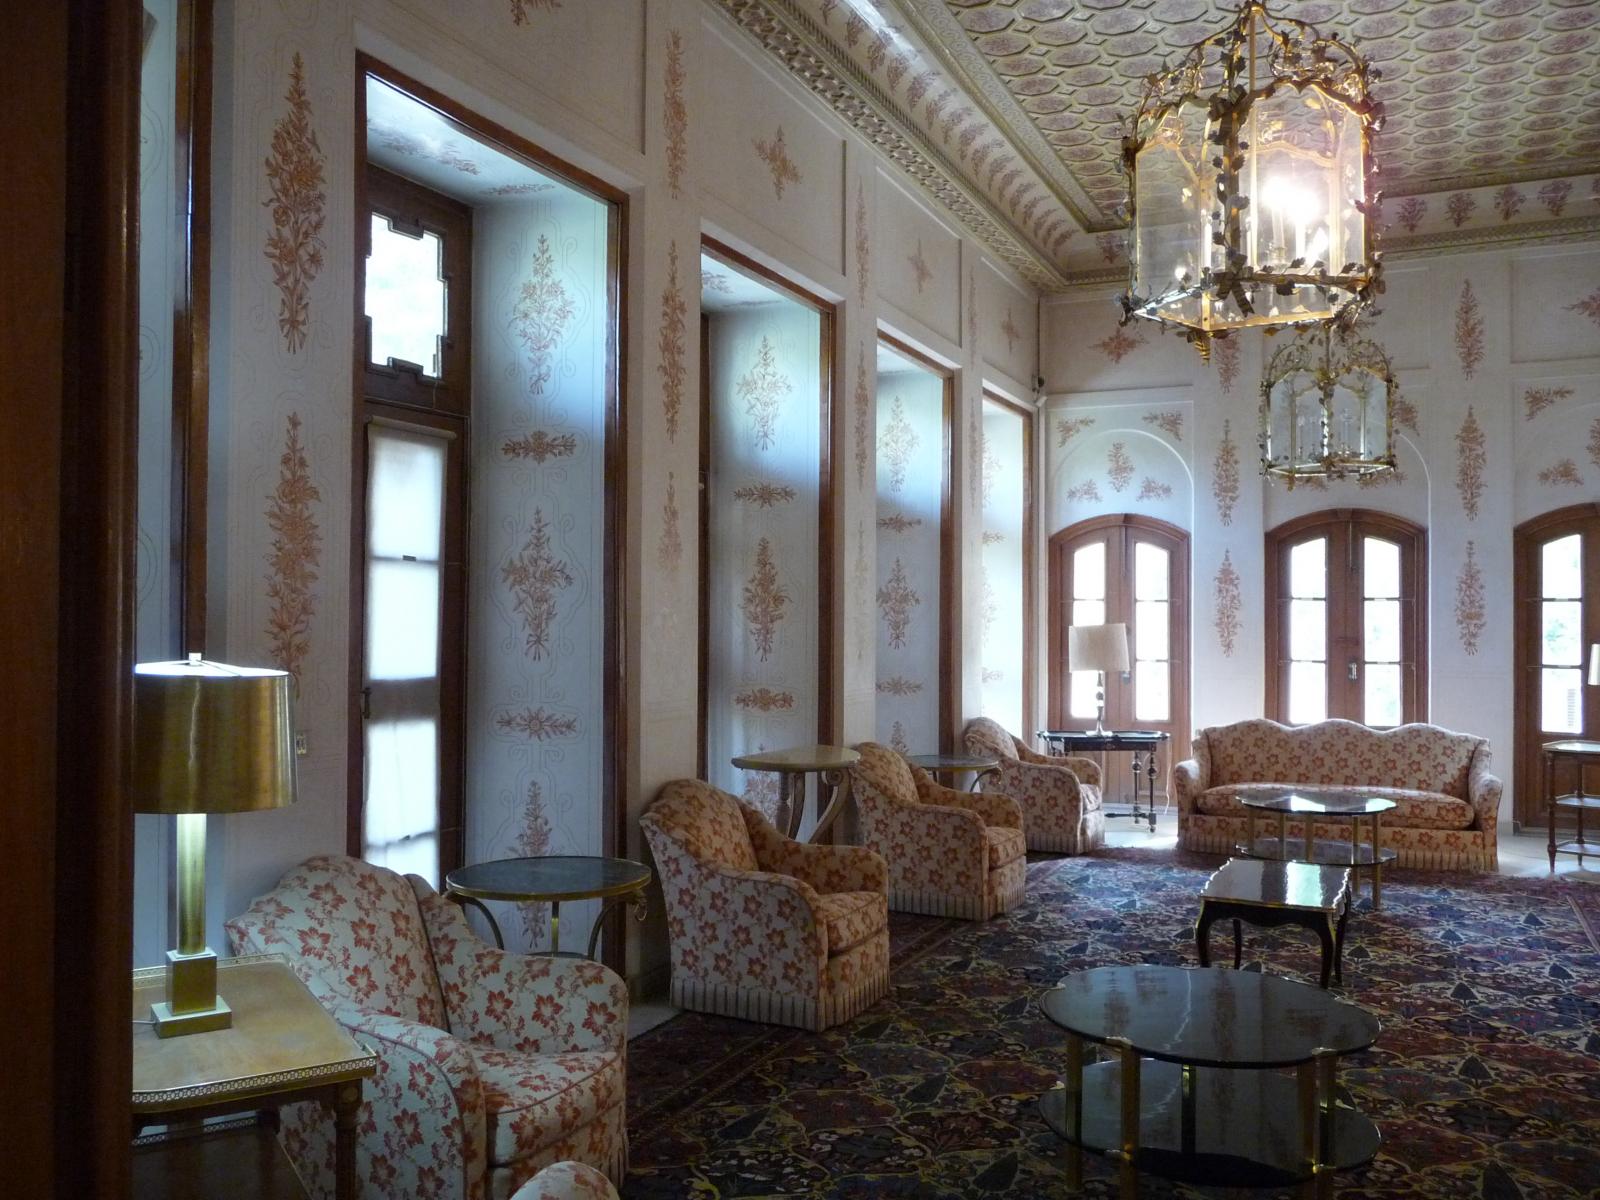 Baq-e Afifabad - Museum - Building Furniture